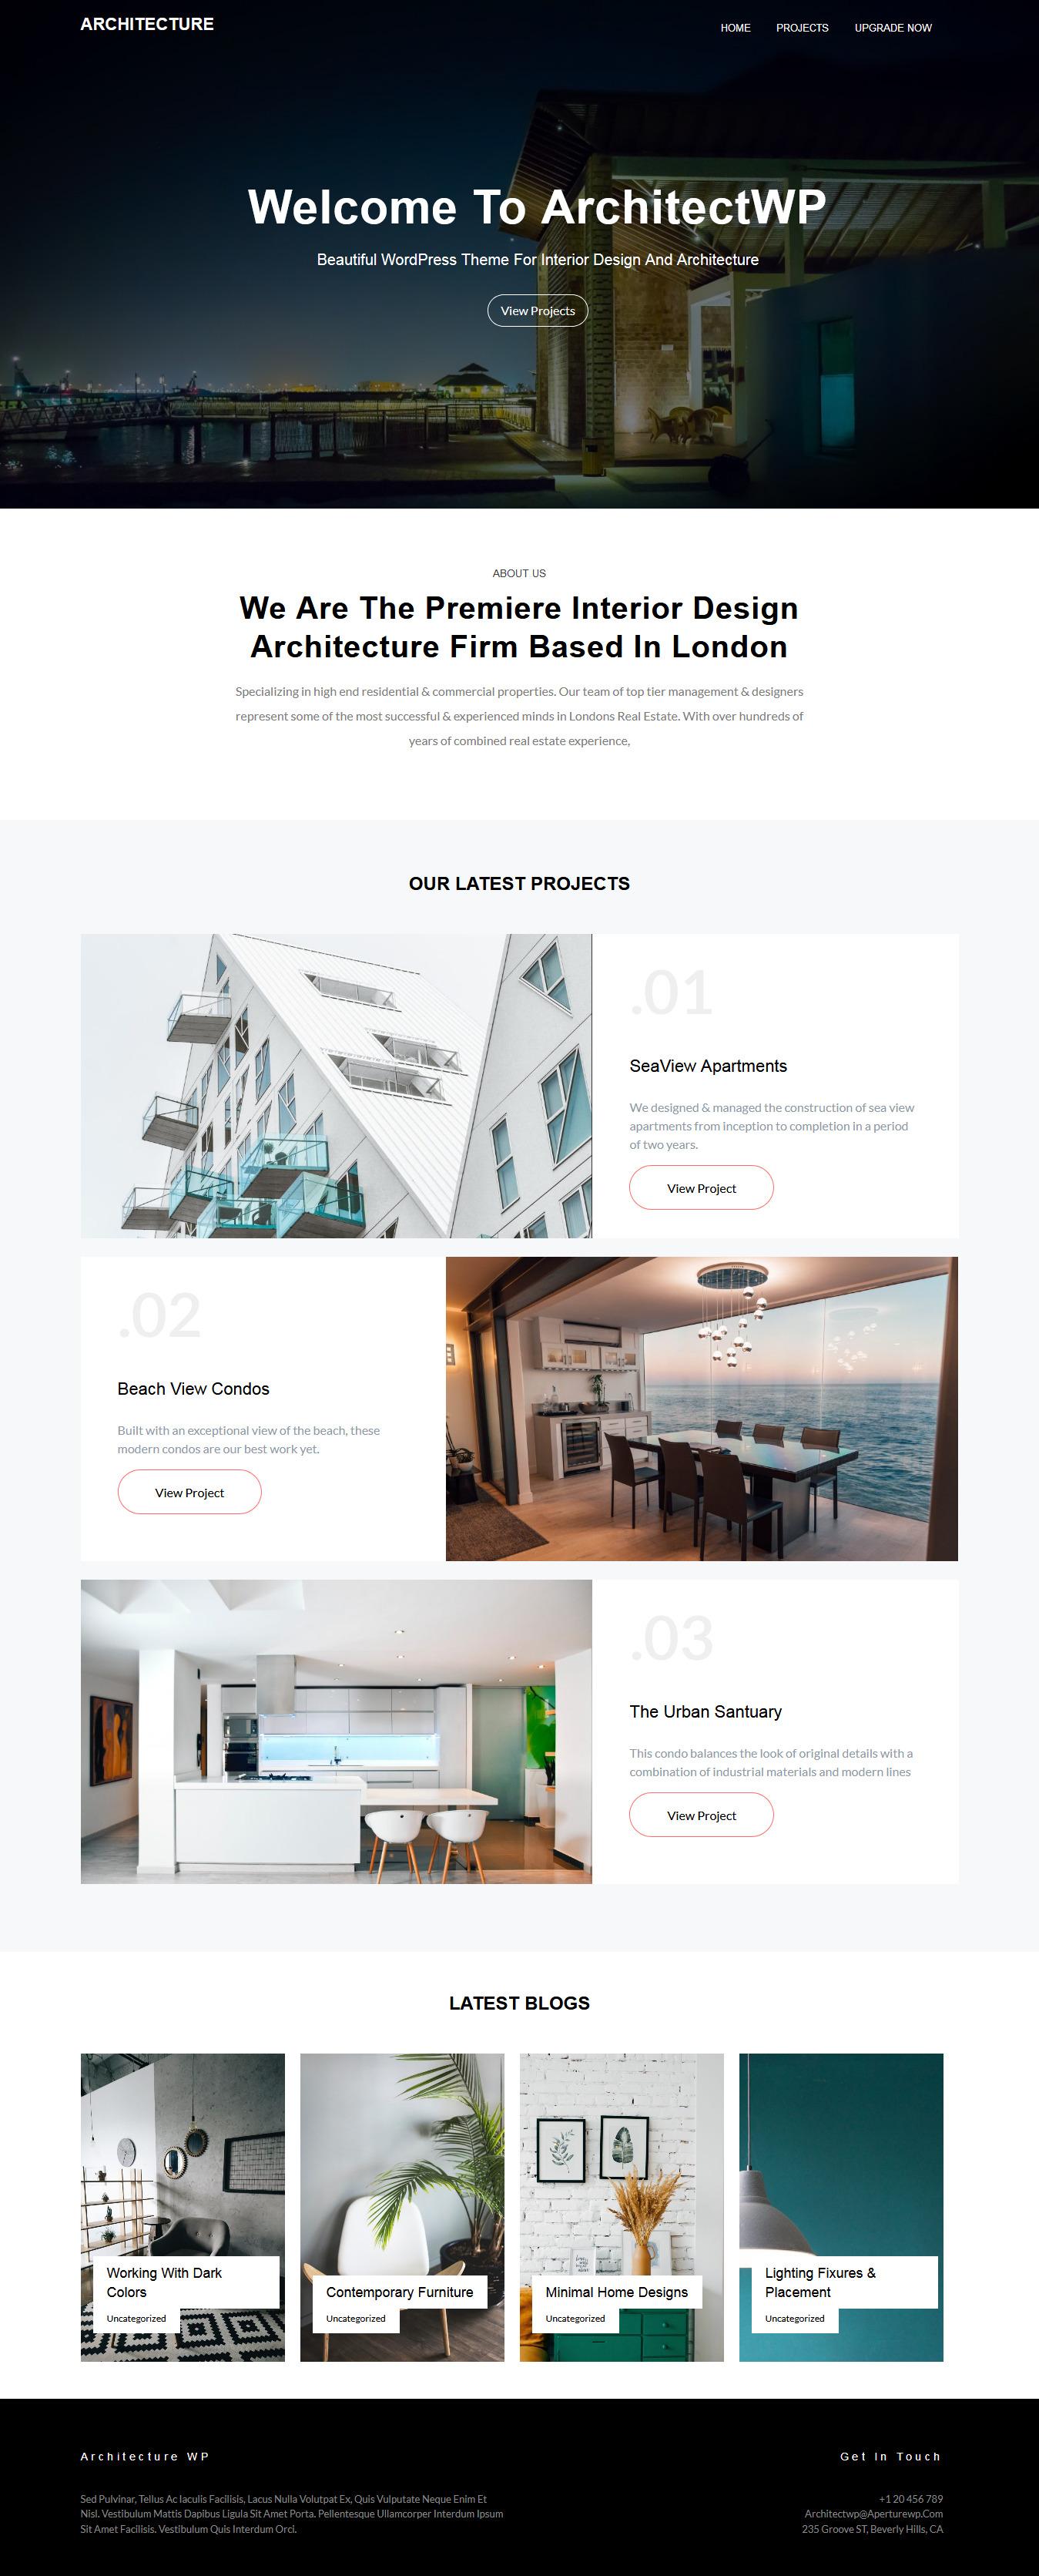 architectwp best free architecture wordpress theme - 10+ Best Free Architecture WordPress Themes